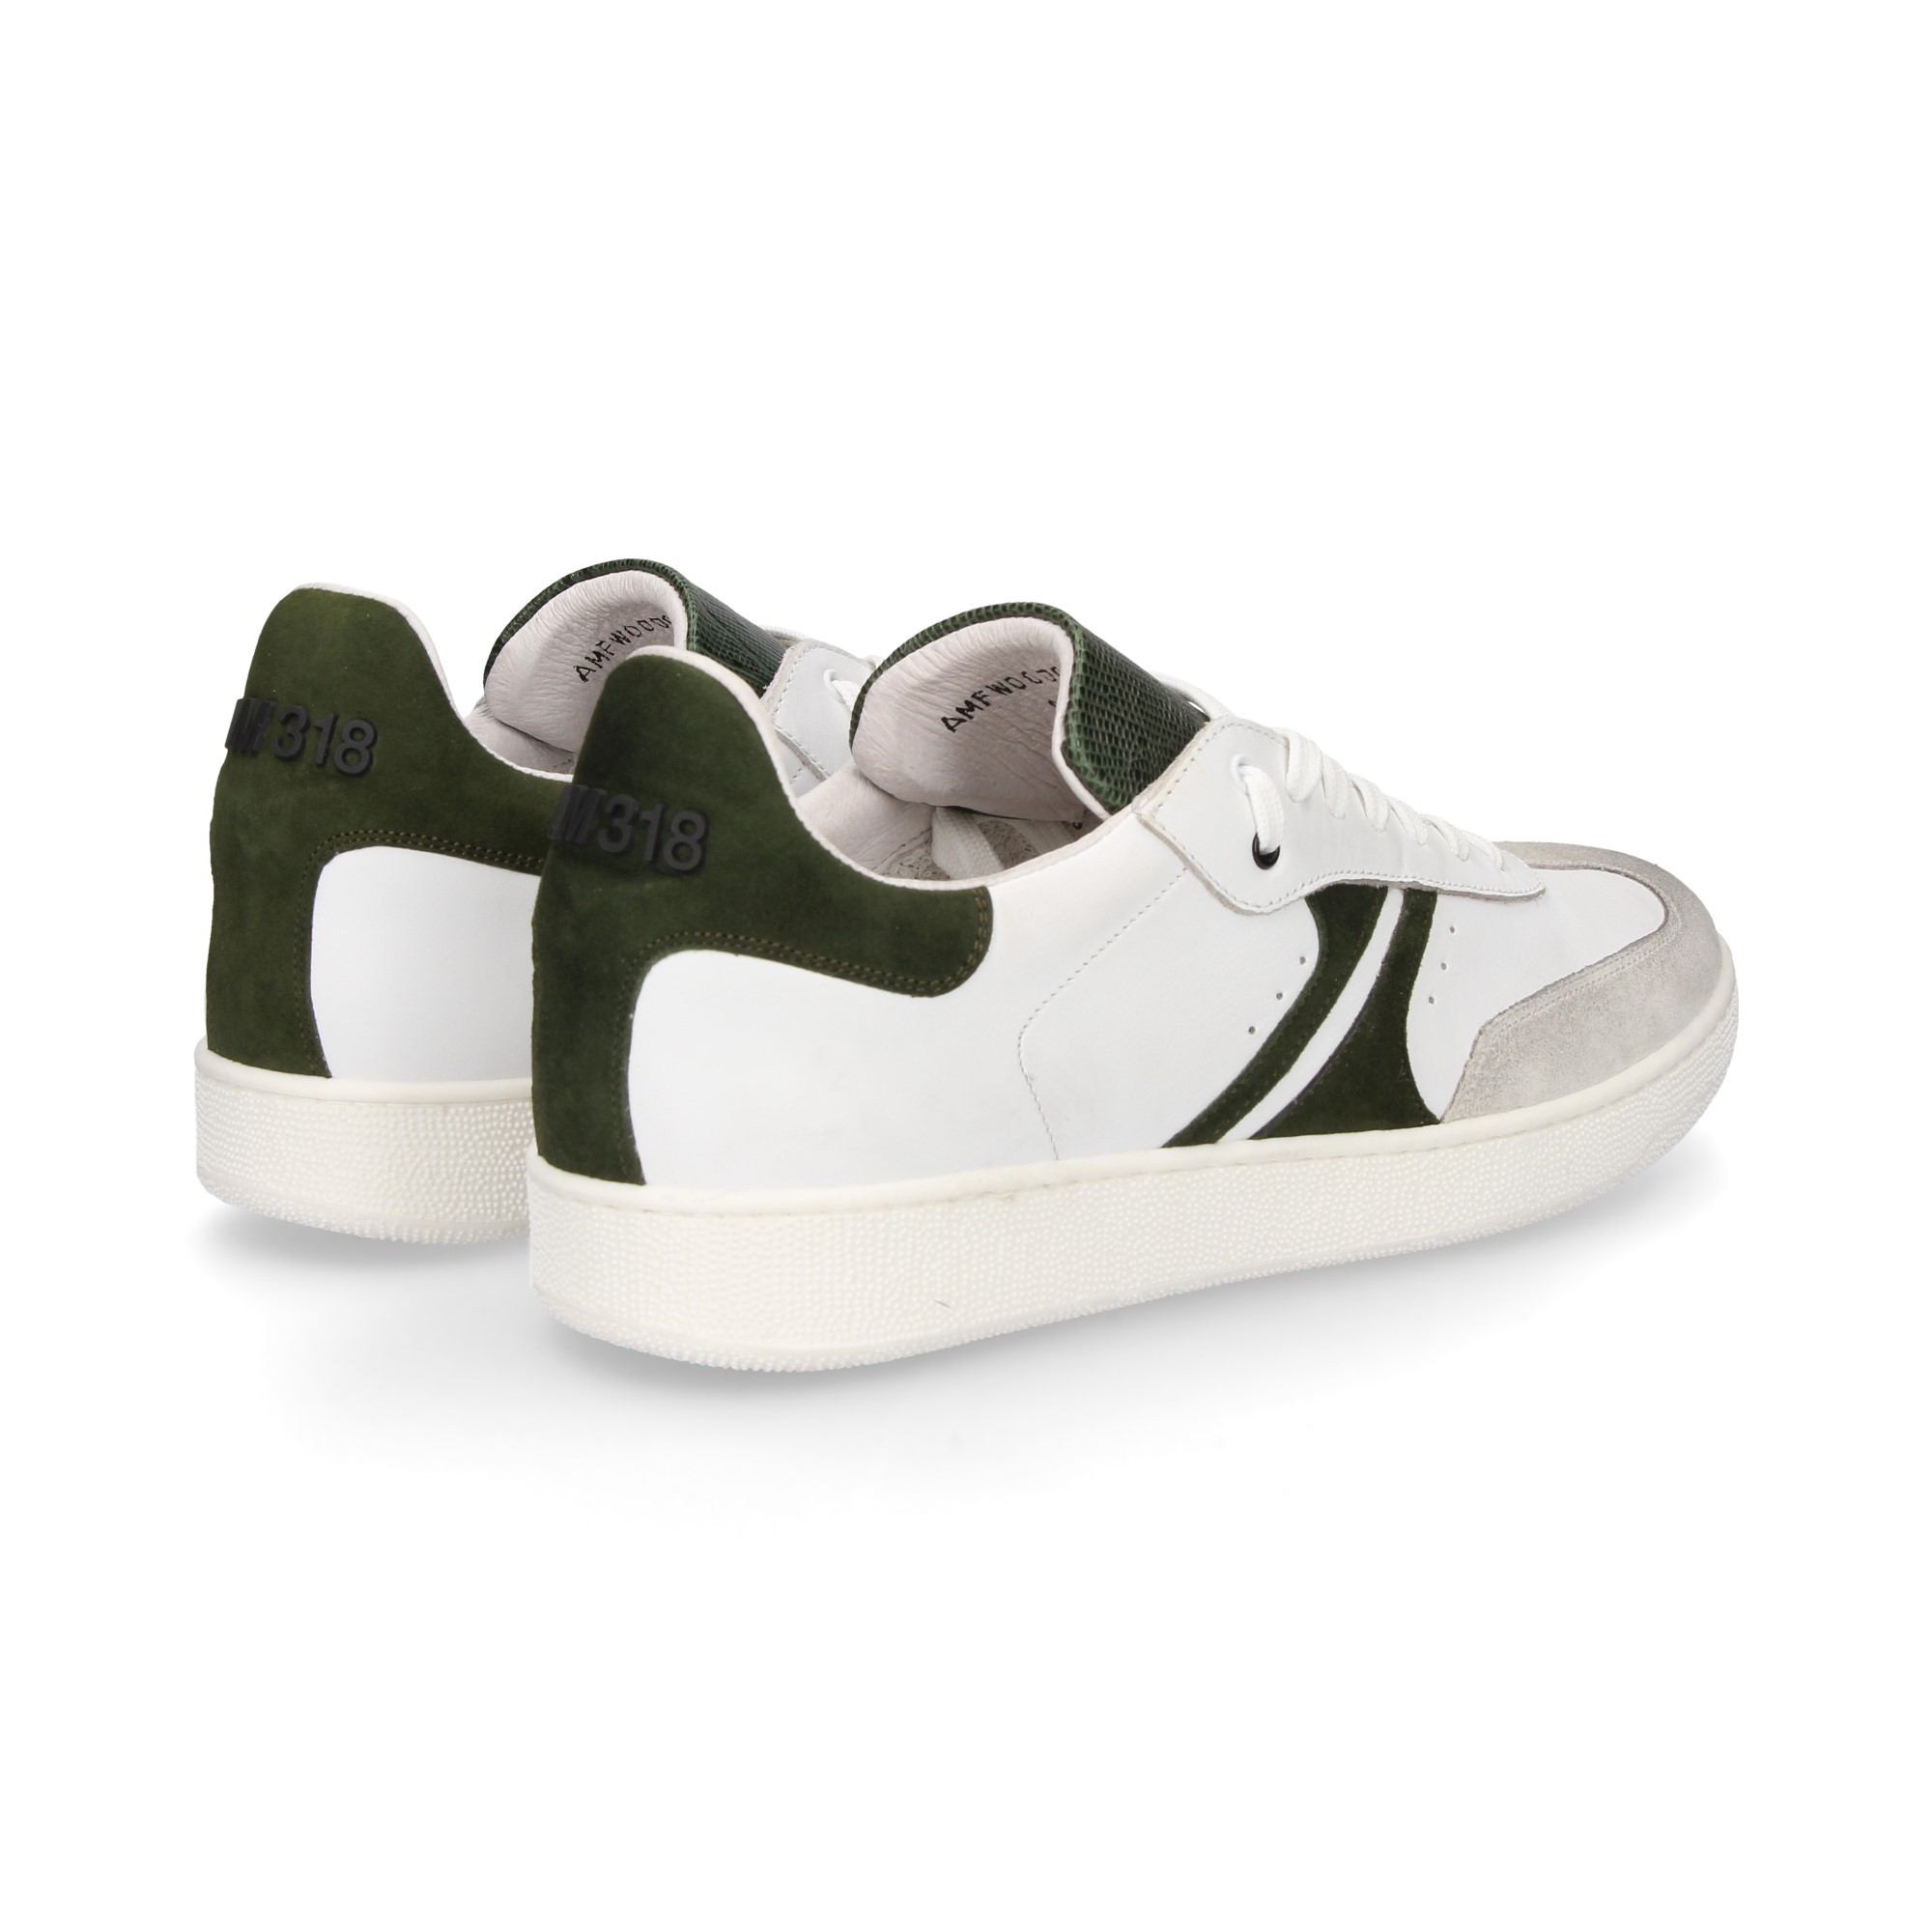 deportivo-cordon-blanco-verde